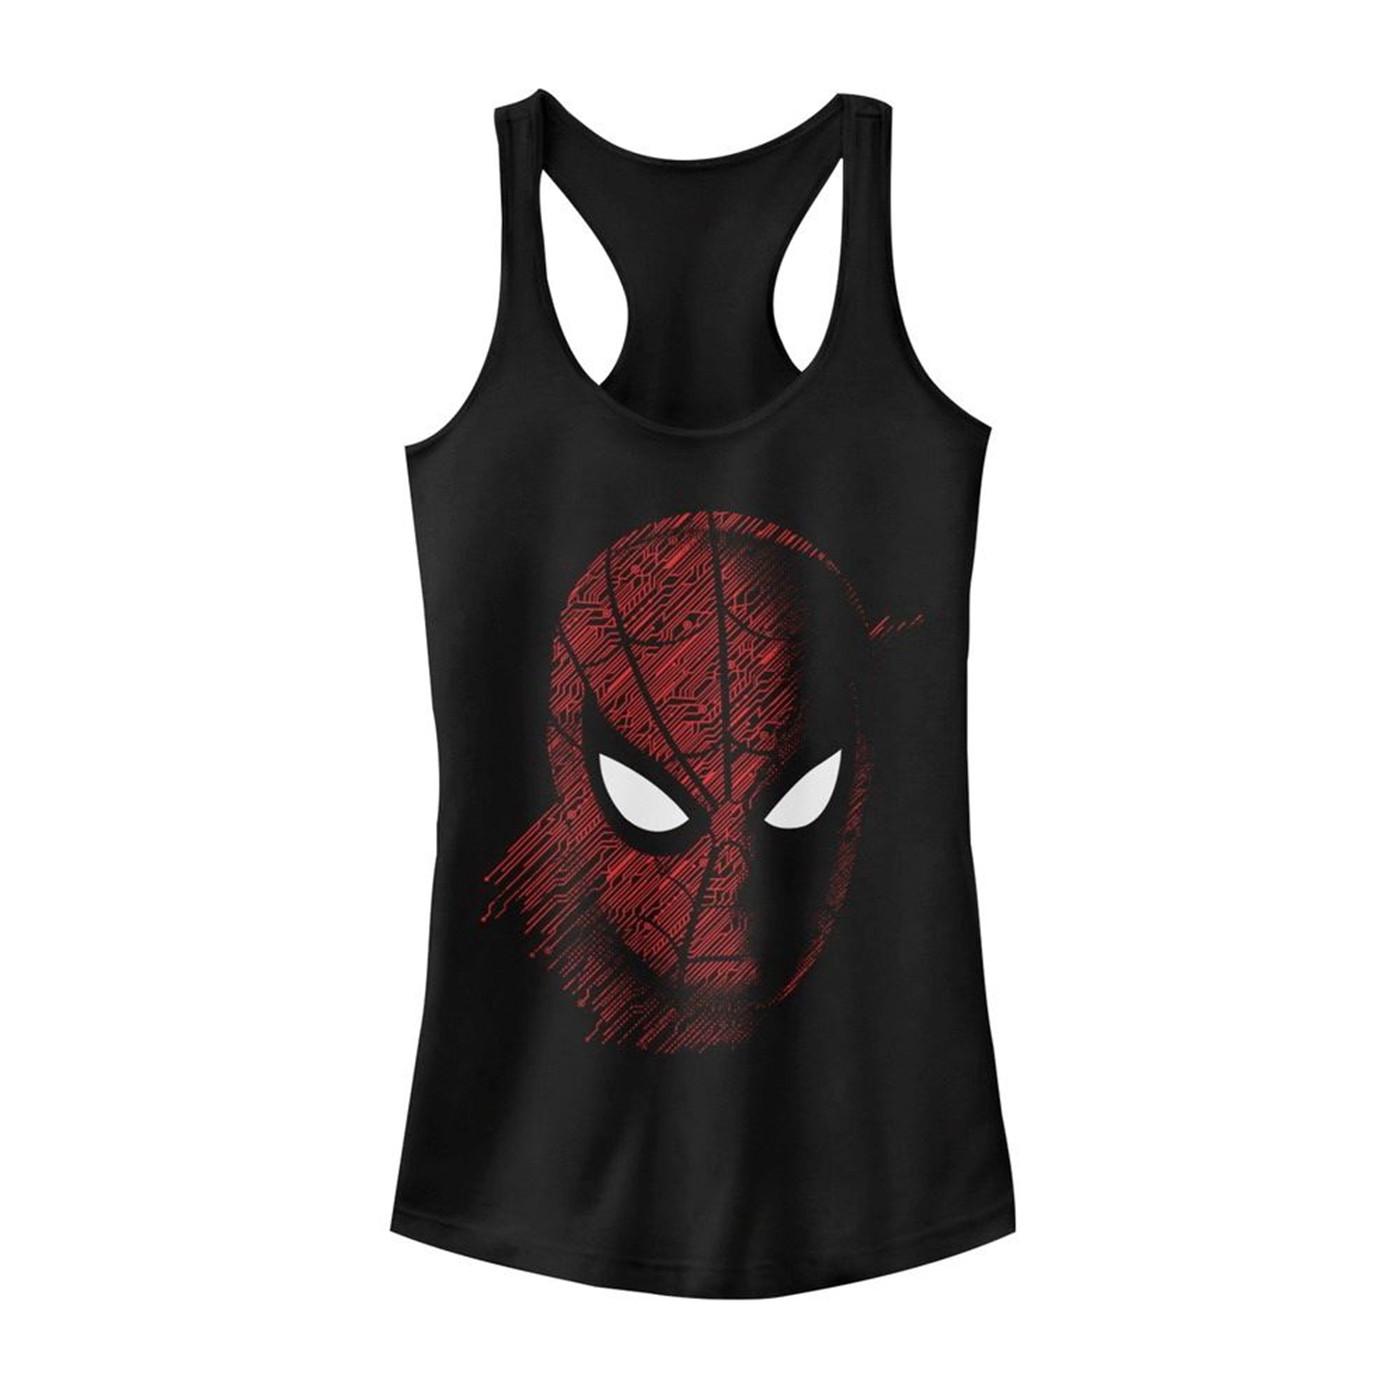 Spider-Man: Far From Home Tech Pattern Women's Tank Top